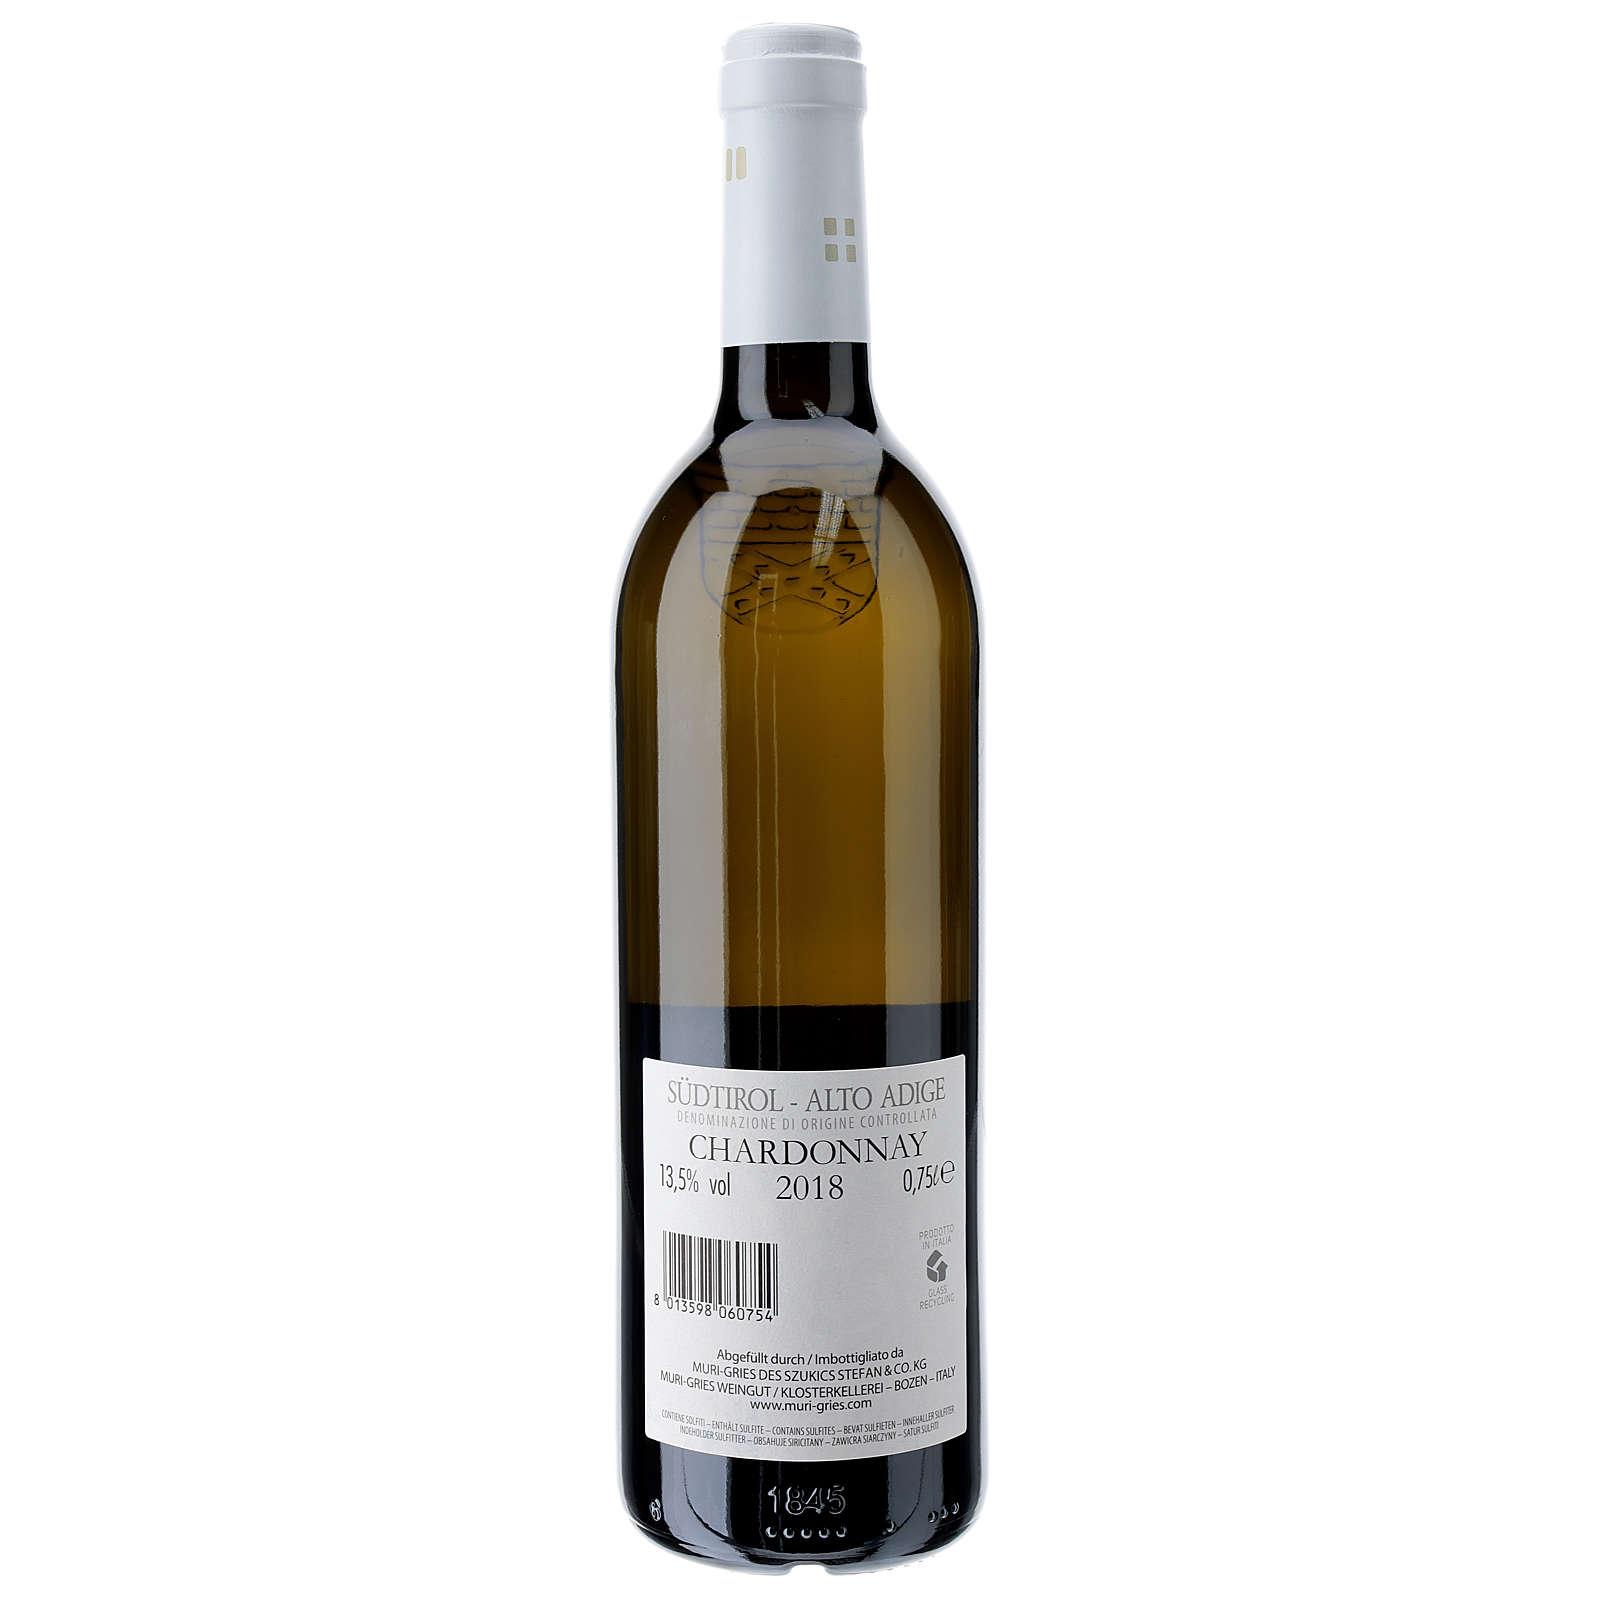 Weisswein Chardonnay DOC 2018 Abtei Muri Gries 3